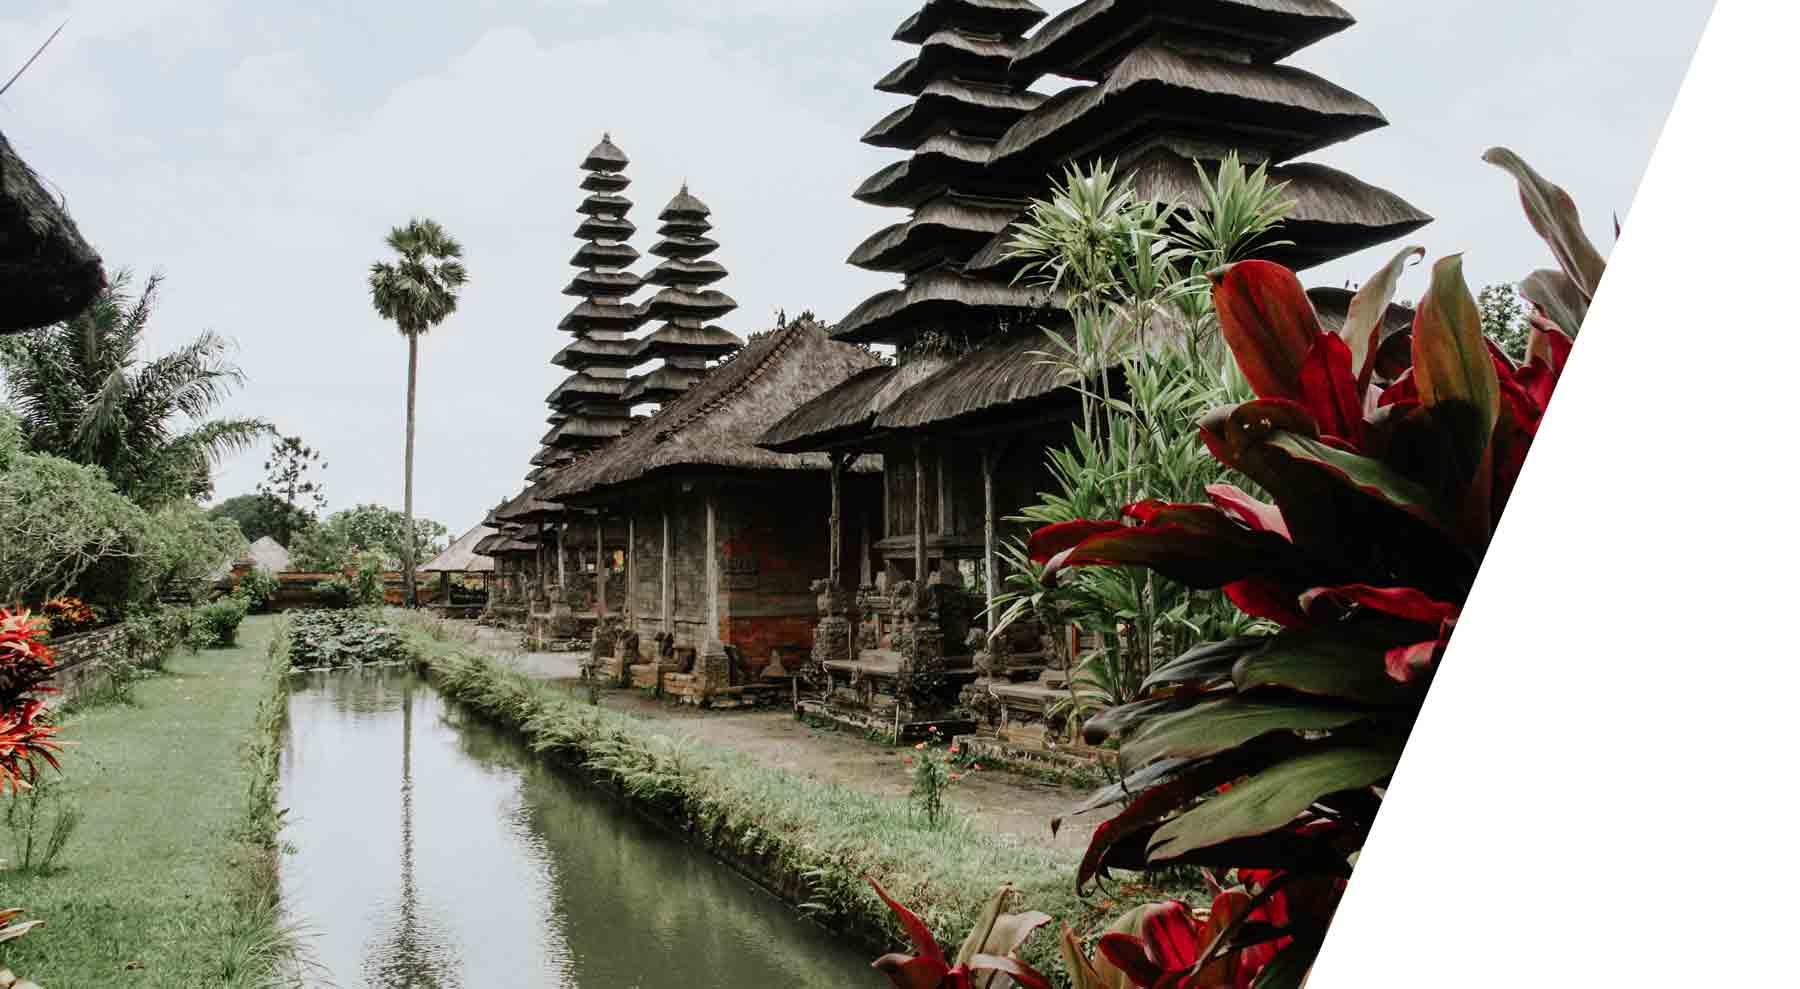 Balinese village